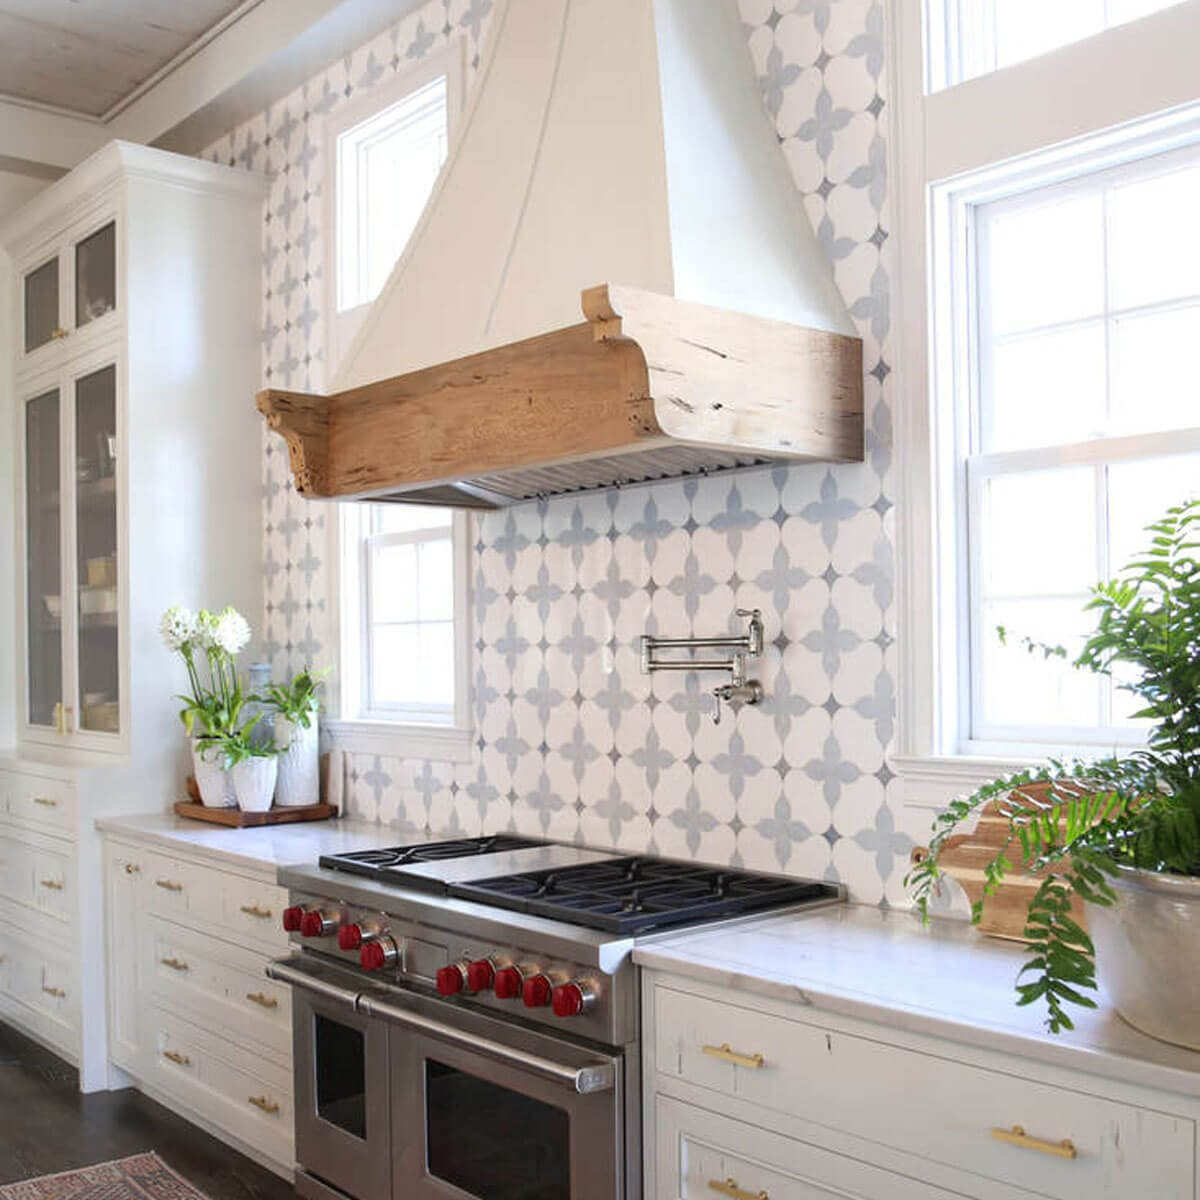 Best Kitchen Backsplash Ideas With White Cabinets Family Handyman